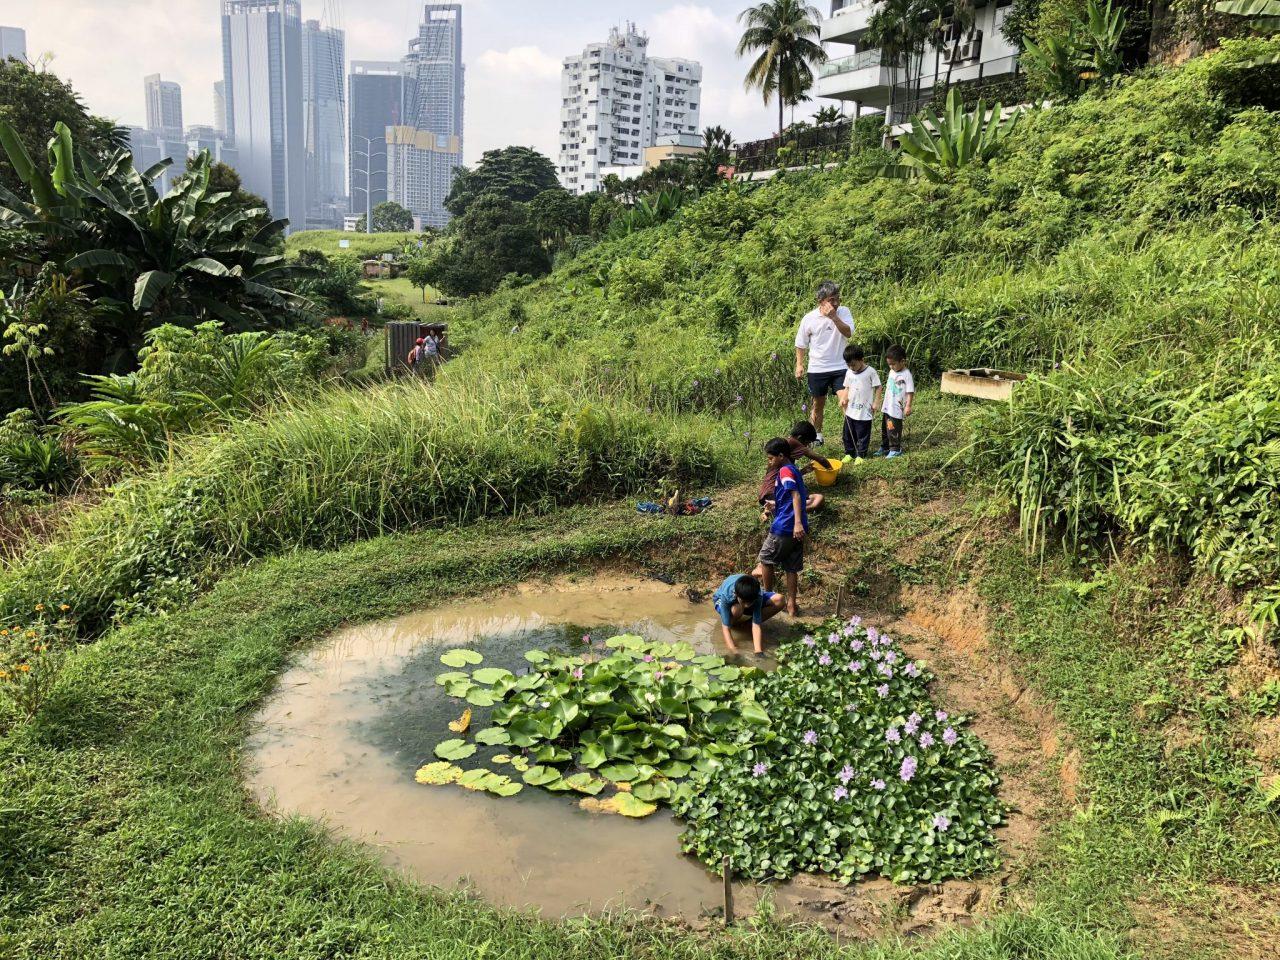 Kebun-Kebun Bangsar พื้นที่ไร้ประโยชน์สู่สวนสีเขียวมากคุณค่าสำหรับชุมชนในมาเลเซีย